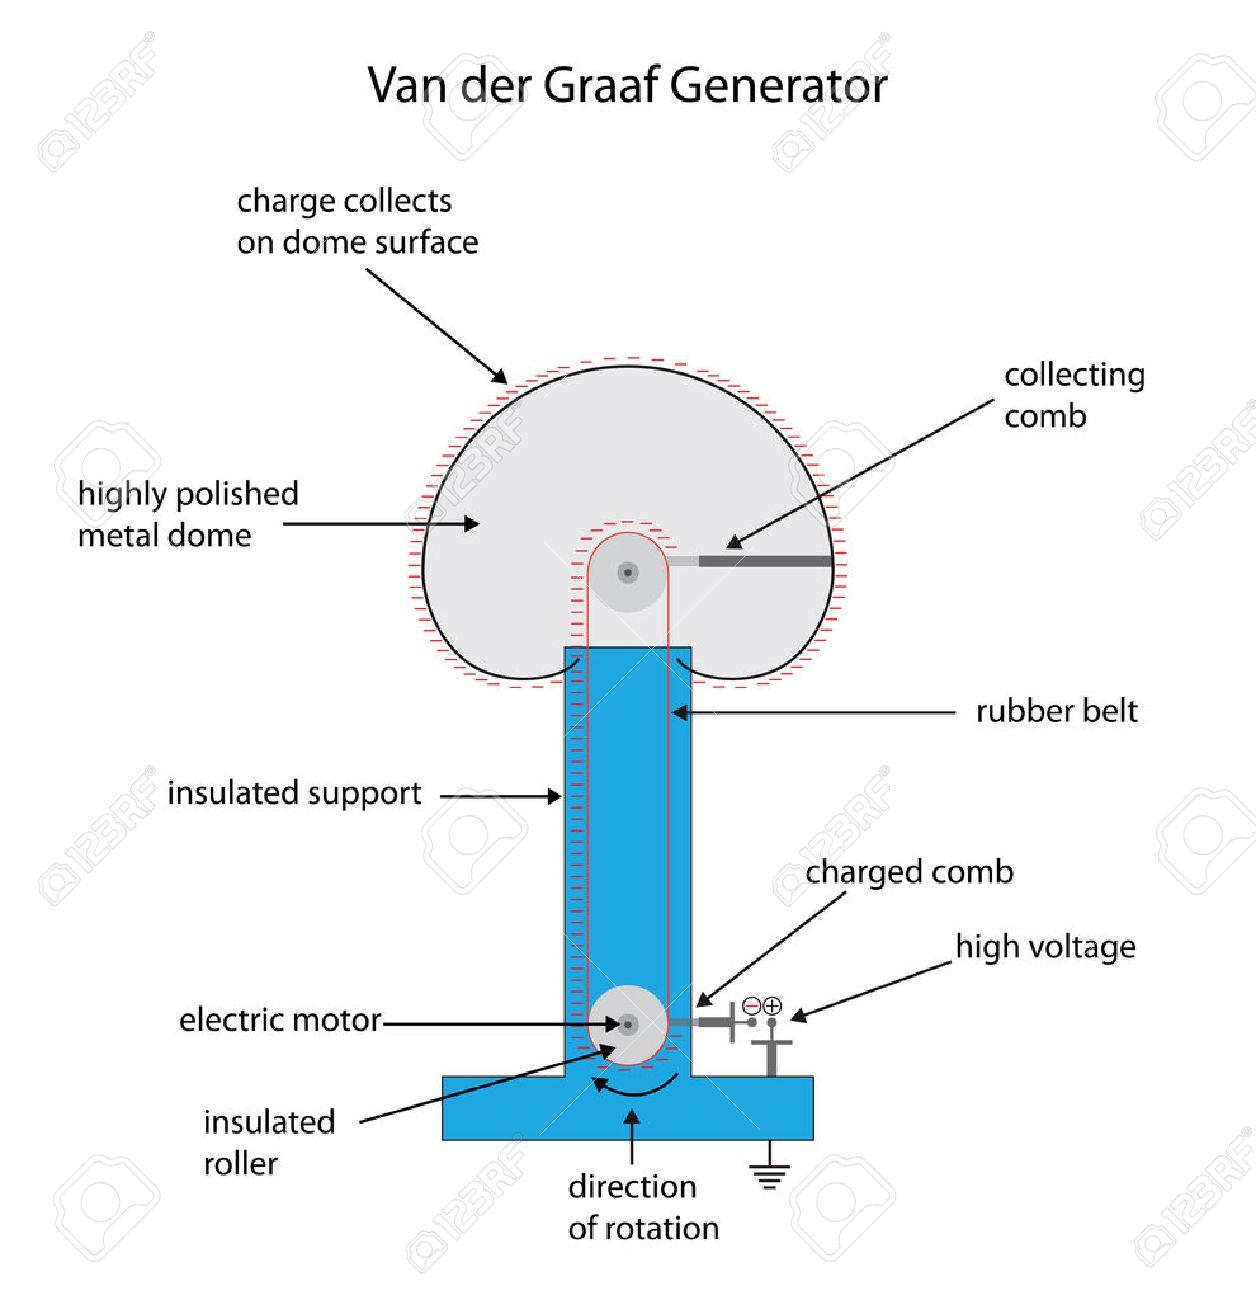 Labeled diagram of a van der graaf generator for electrostatic labeled diagram of a van der graaf generator for electrostatic charge stock vector 37701443 ccuart Choice Image